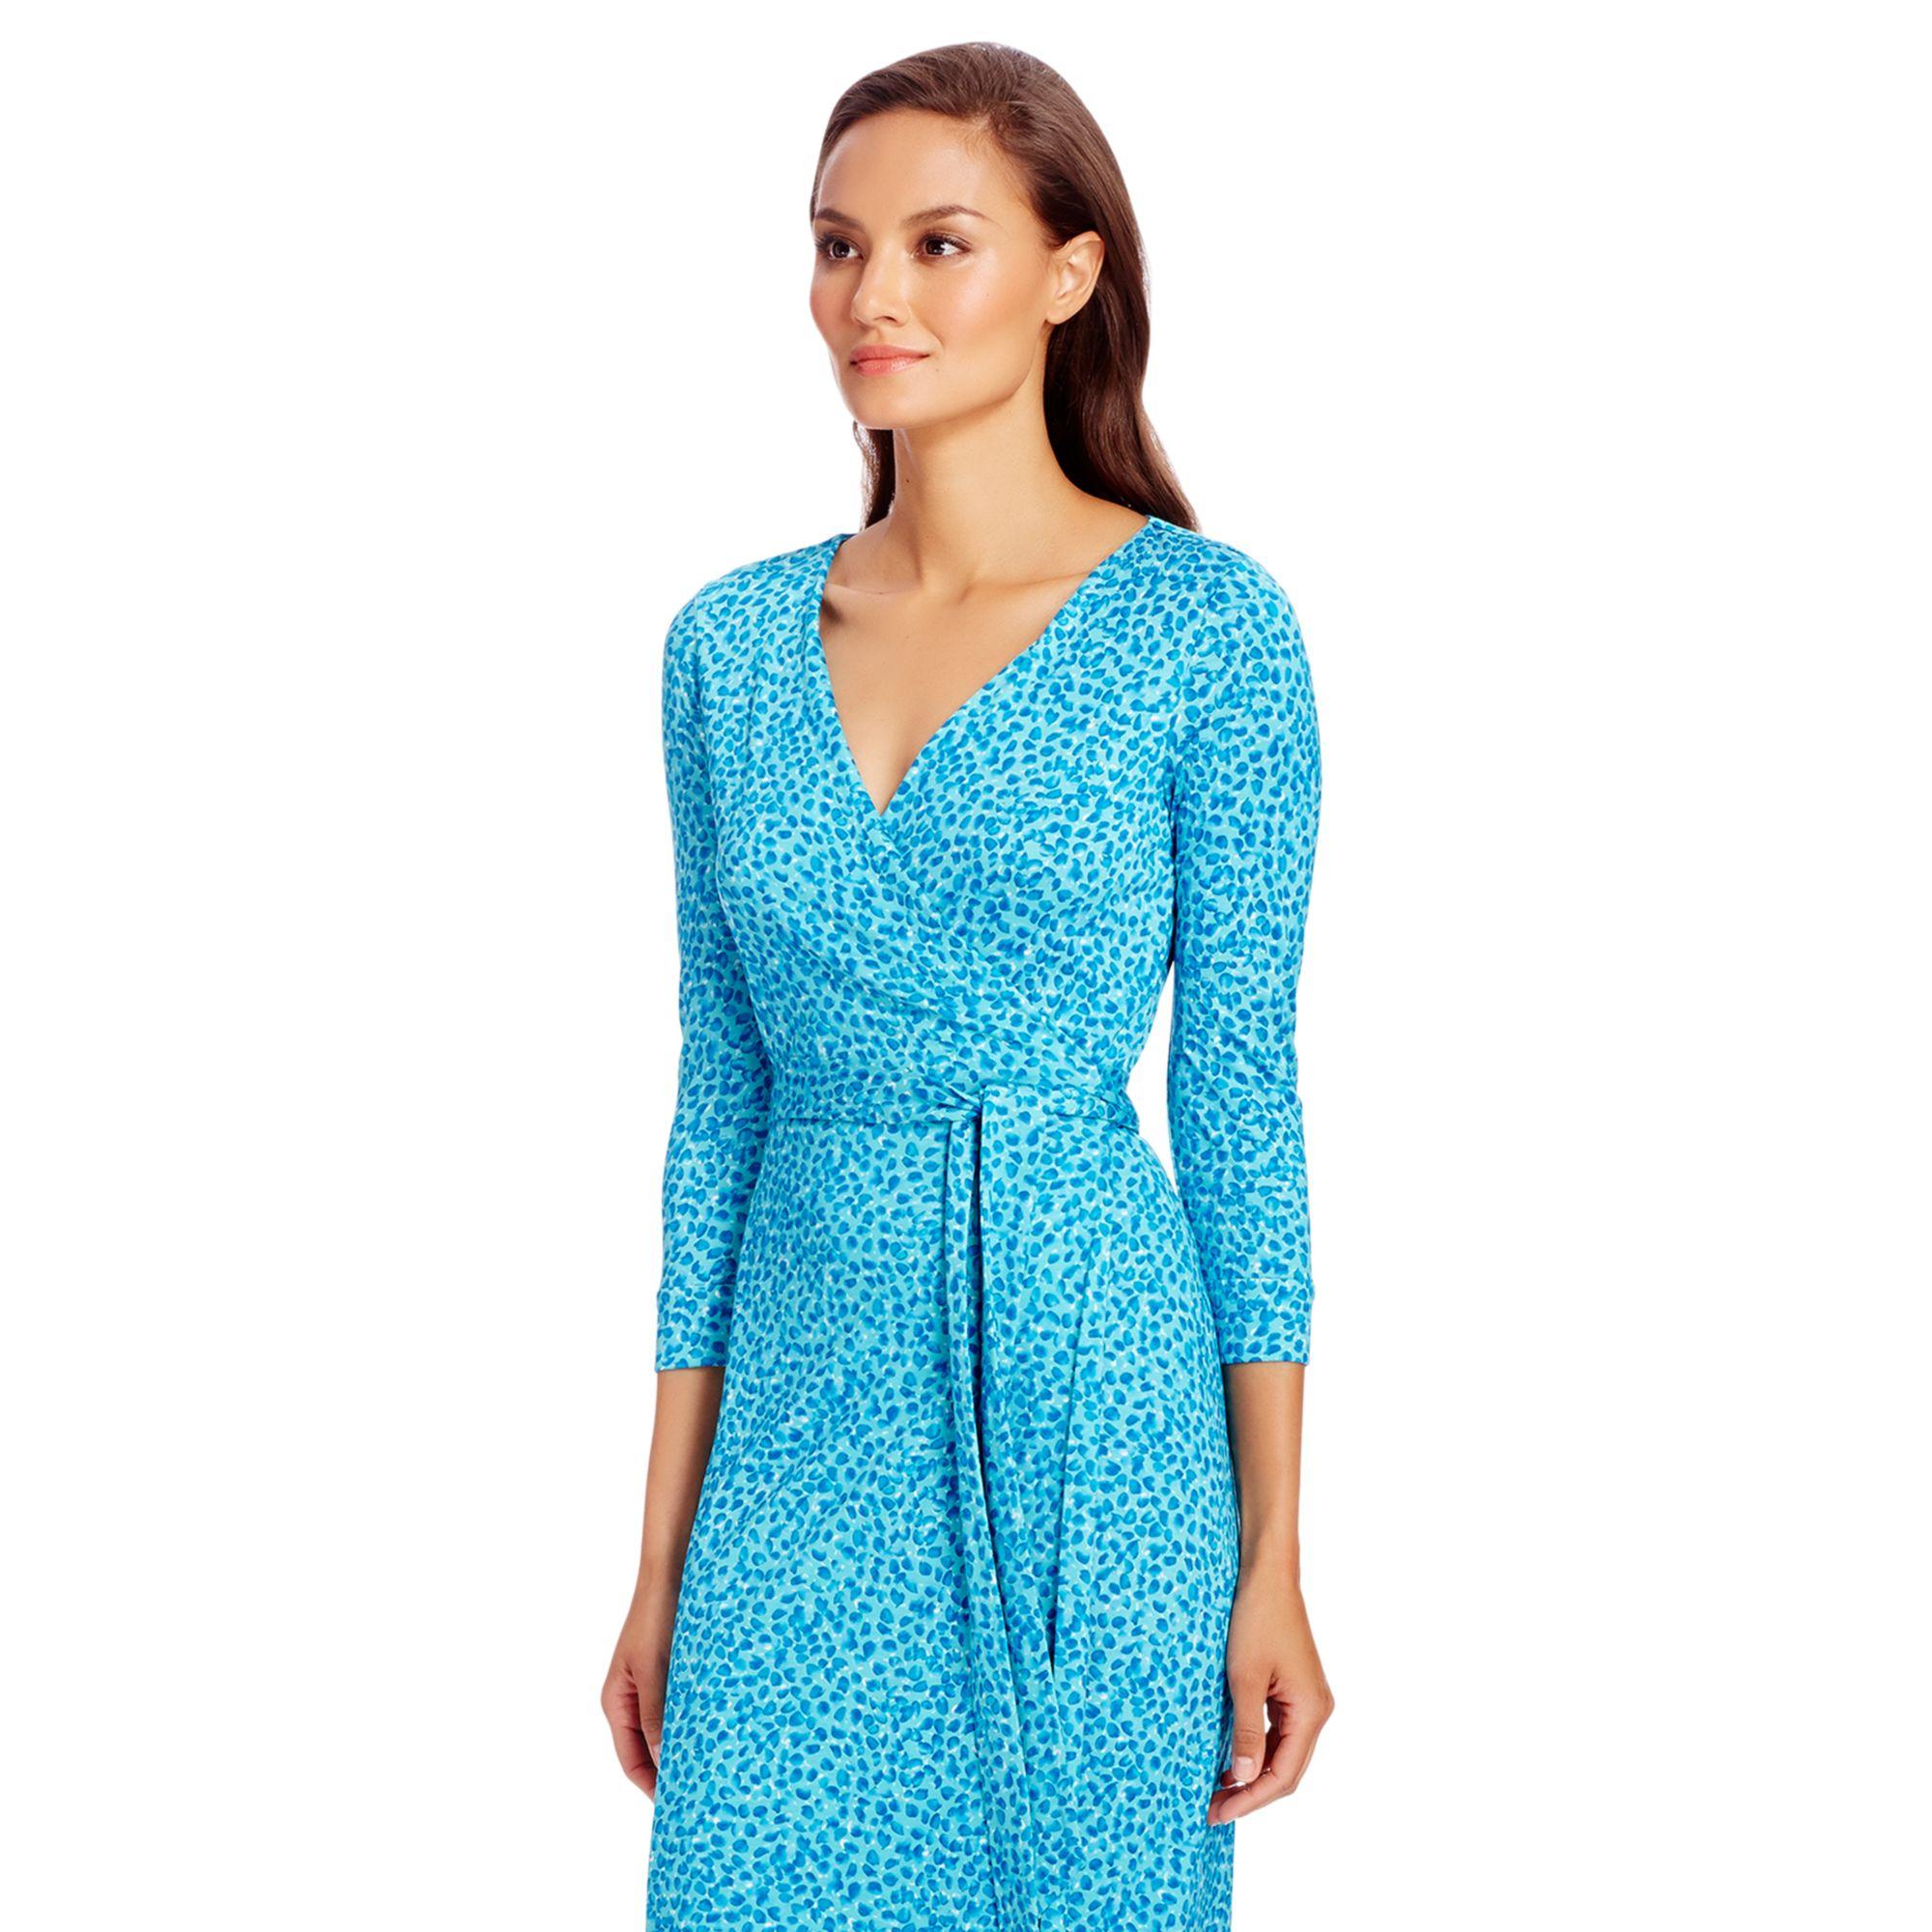 b8a8456877 Diane von Furstenberg New Julian Two Silk Jersey Wrap Dress in Blue ...